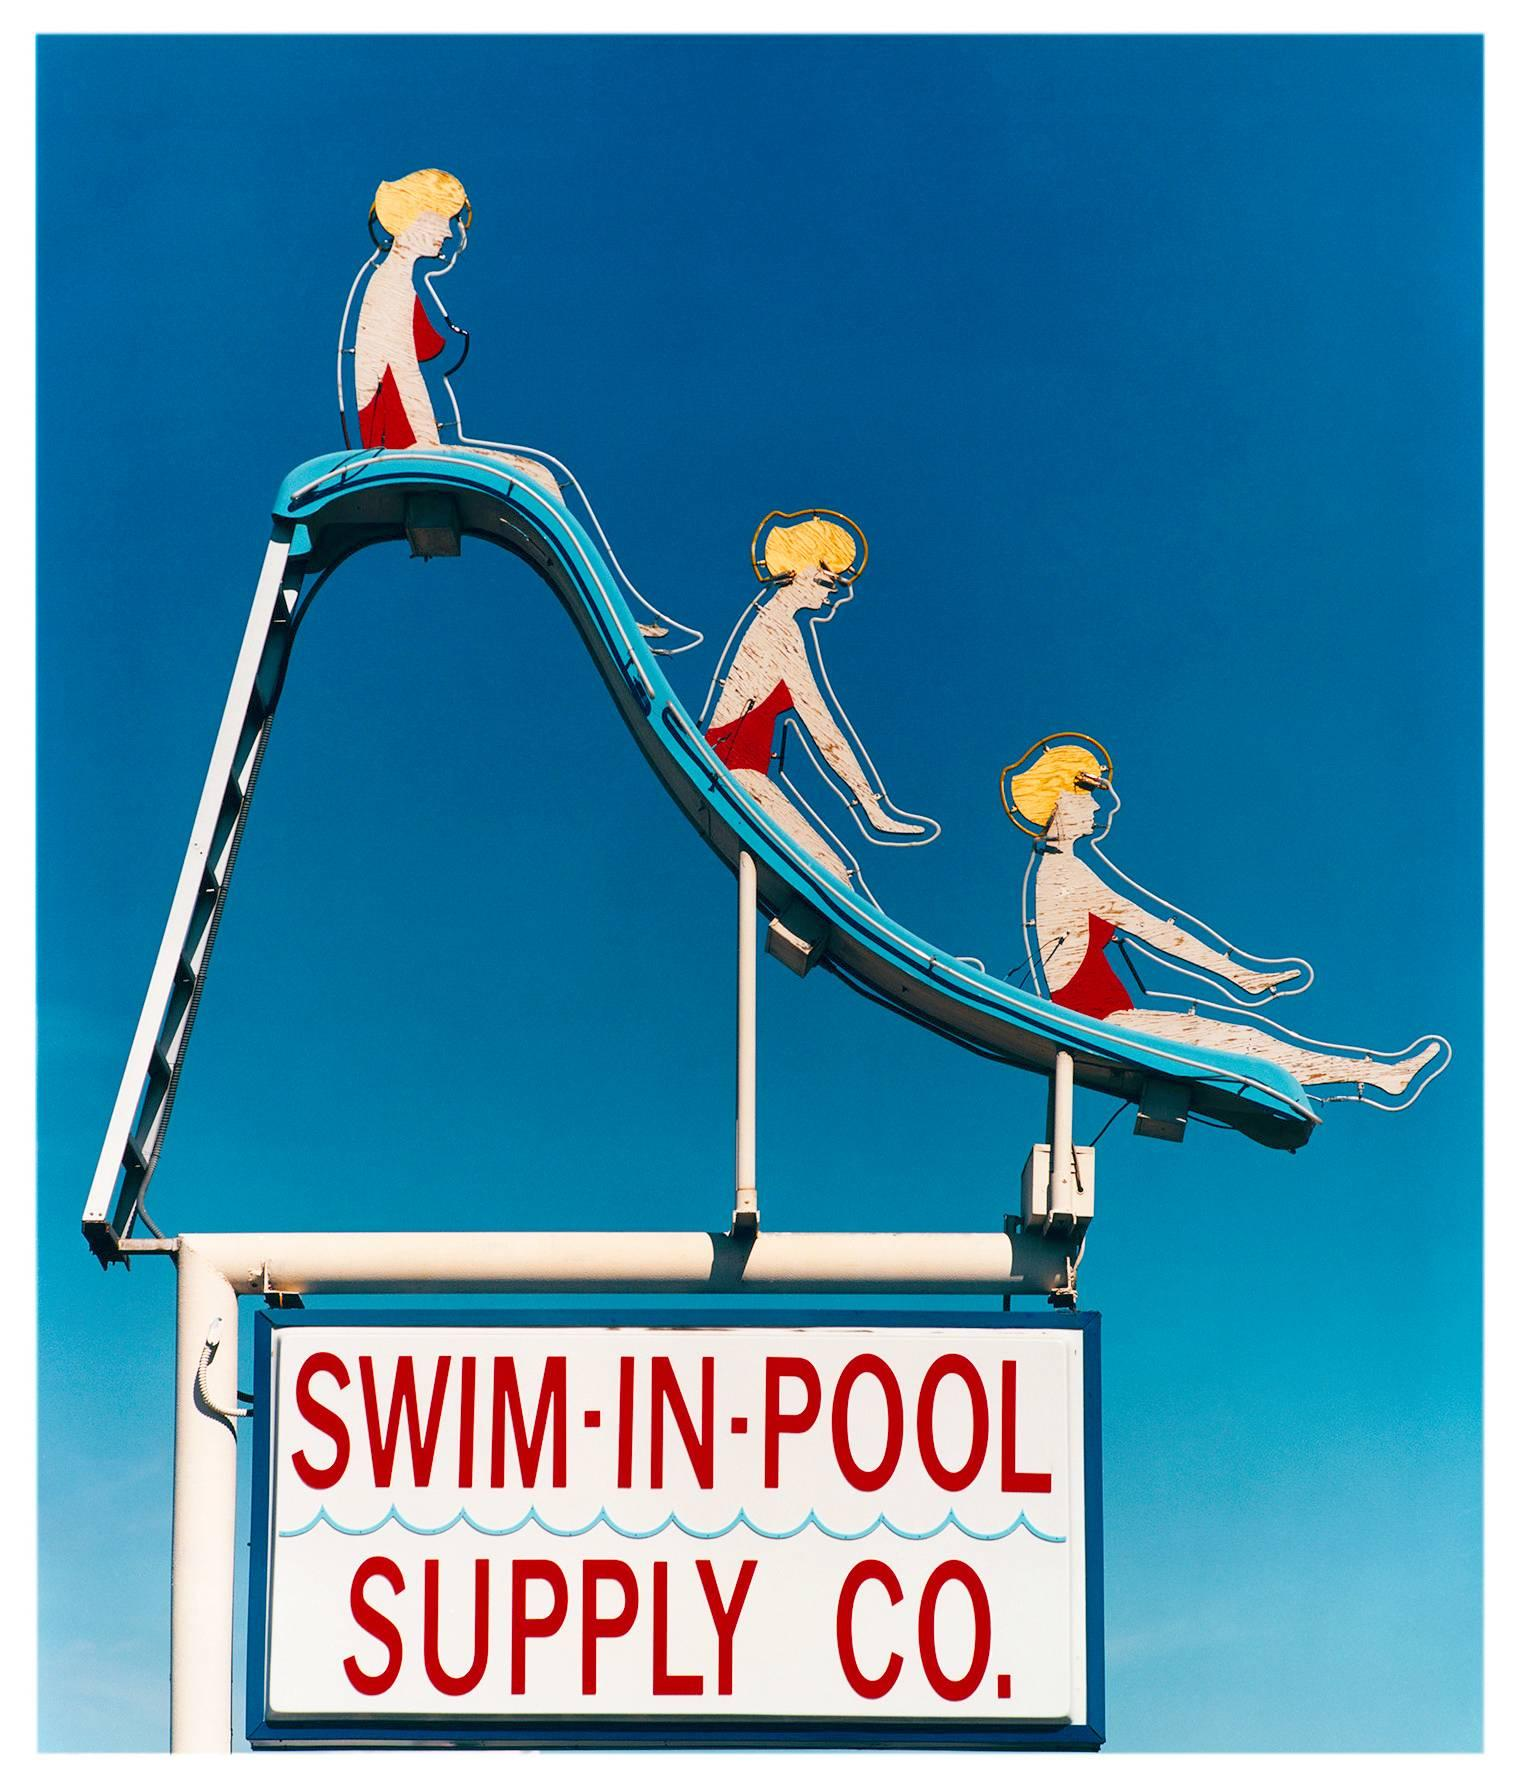 Swim-in-Pool Supply Co. Las Vegas, Nevada - Americana Pop Art Color Photography